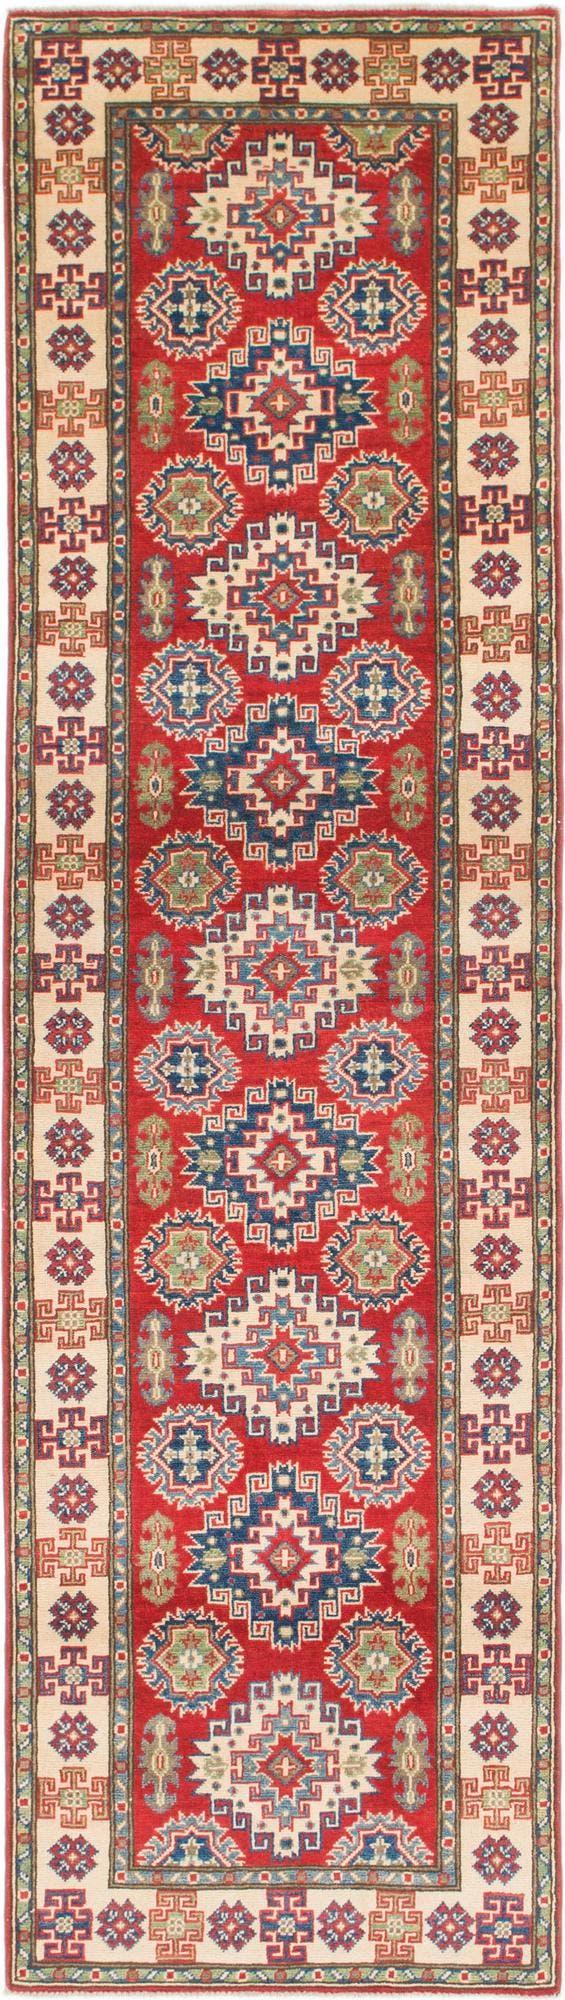 2' 9 x 9' 10 Kazak Runner Rug main image